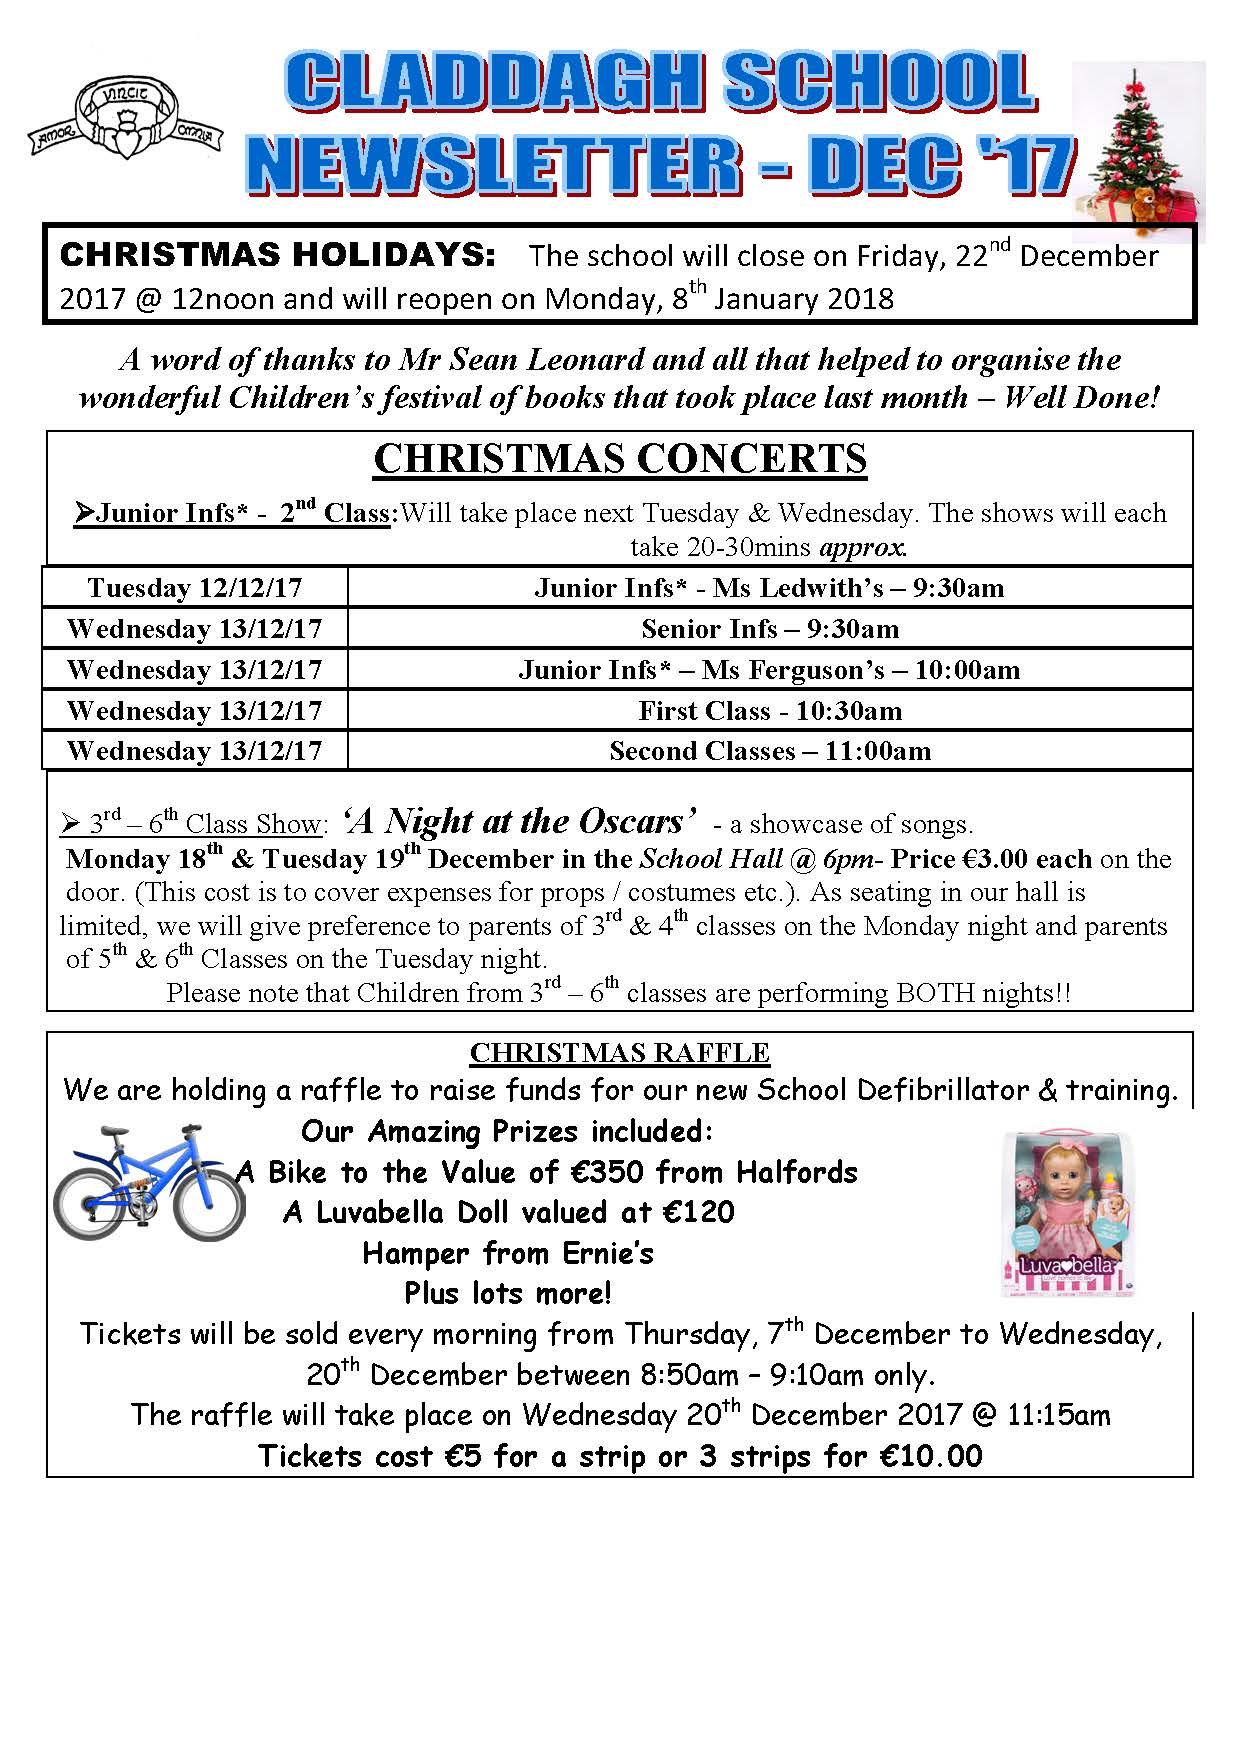 CladdaghNS_Newsletter_December_2017_Page_1.jpg